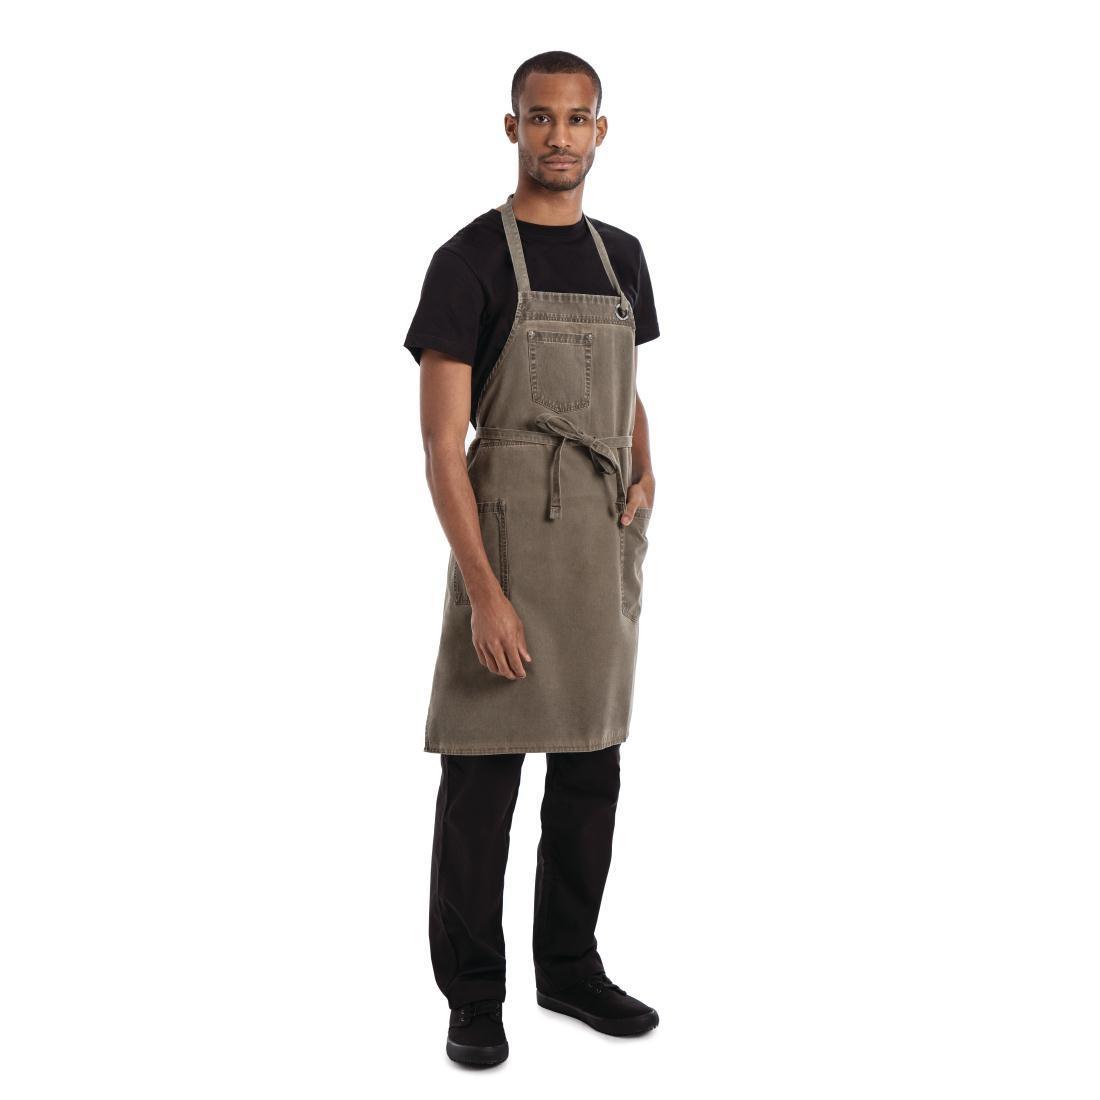 Delantal marrón con peto modelo Dorset Chef Works BB002